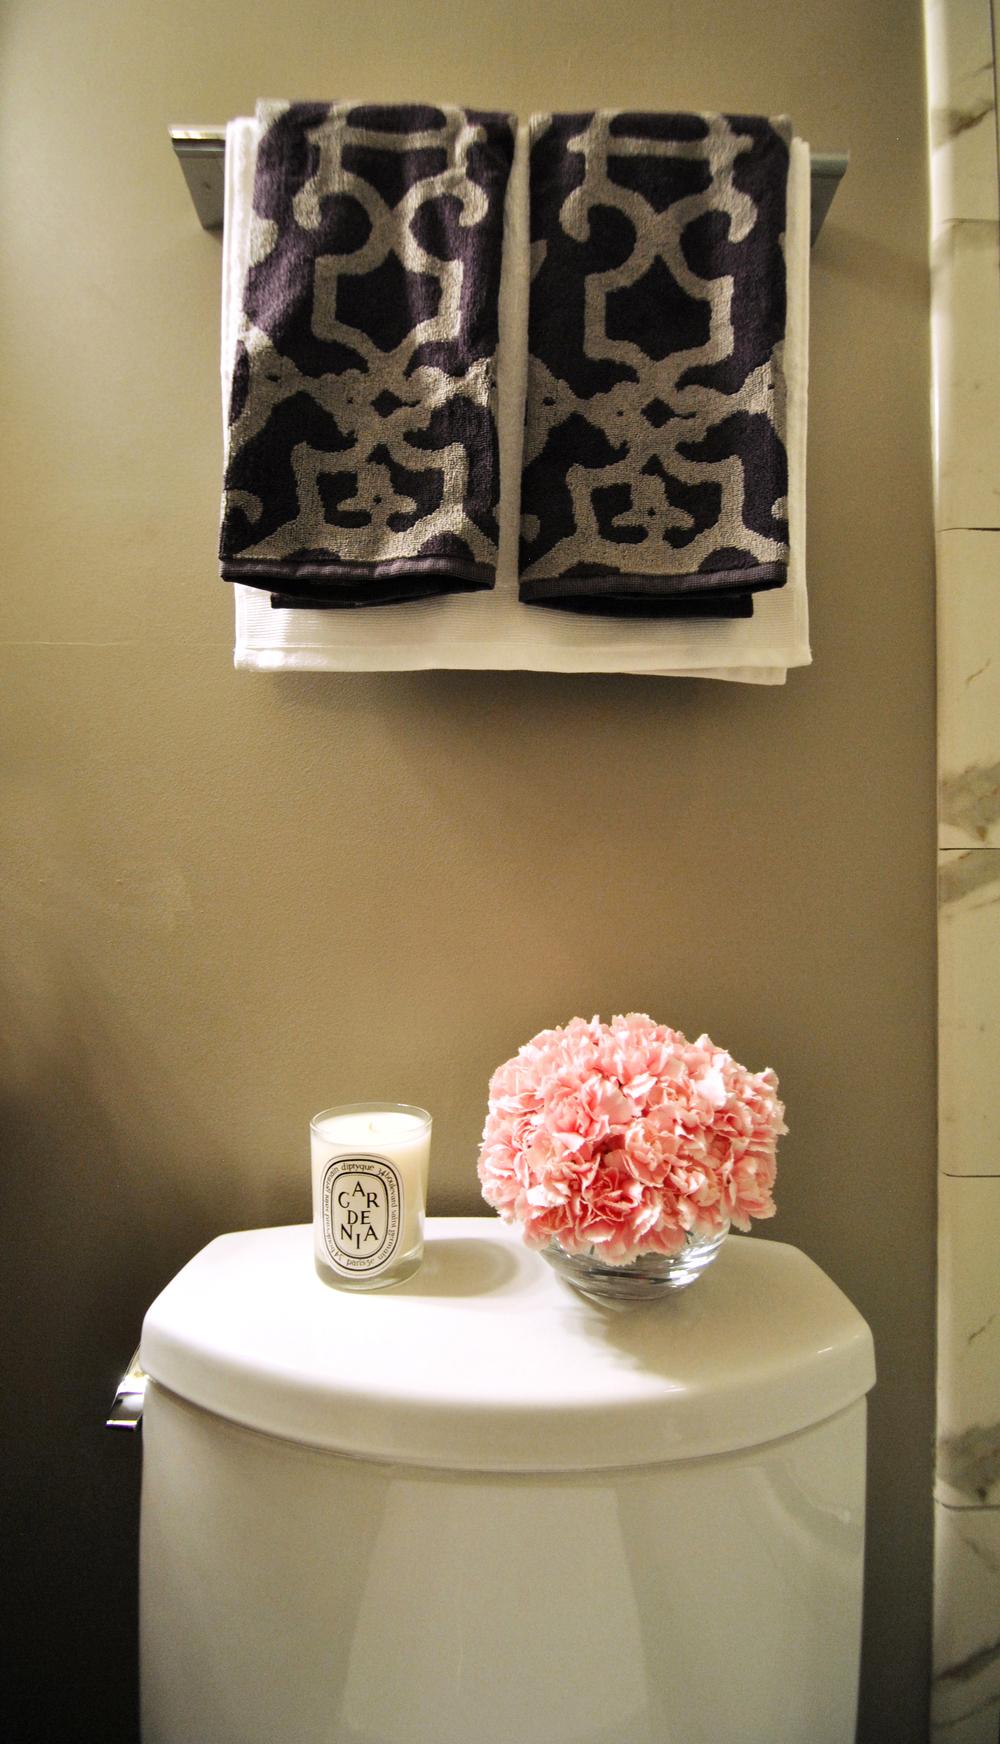 4 chicago bath renovation atelier bea brooke henton copy.jpg